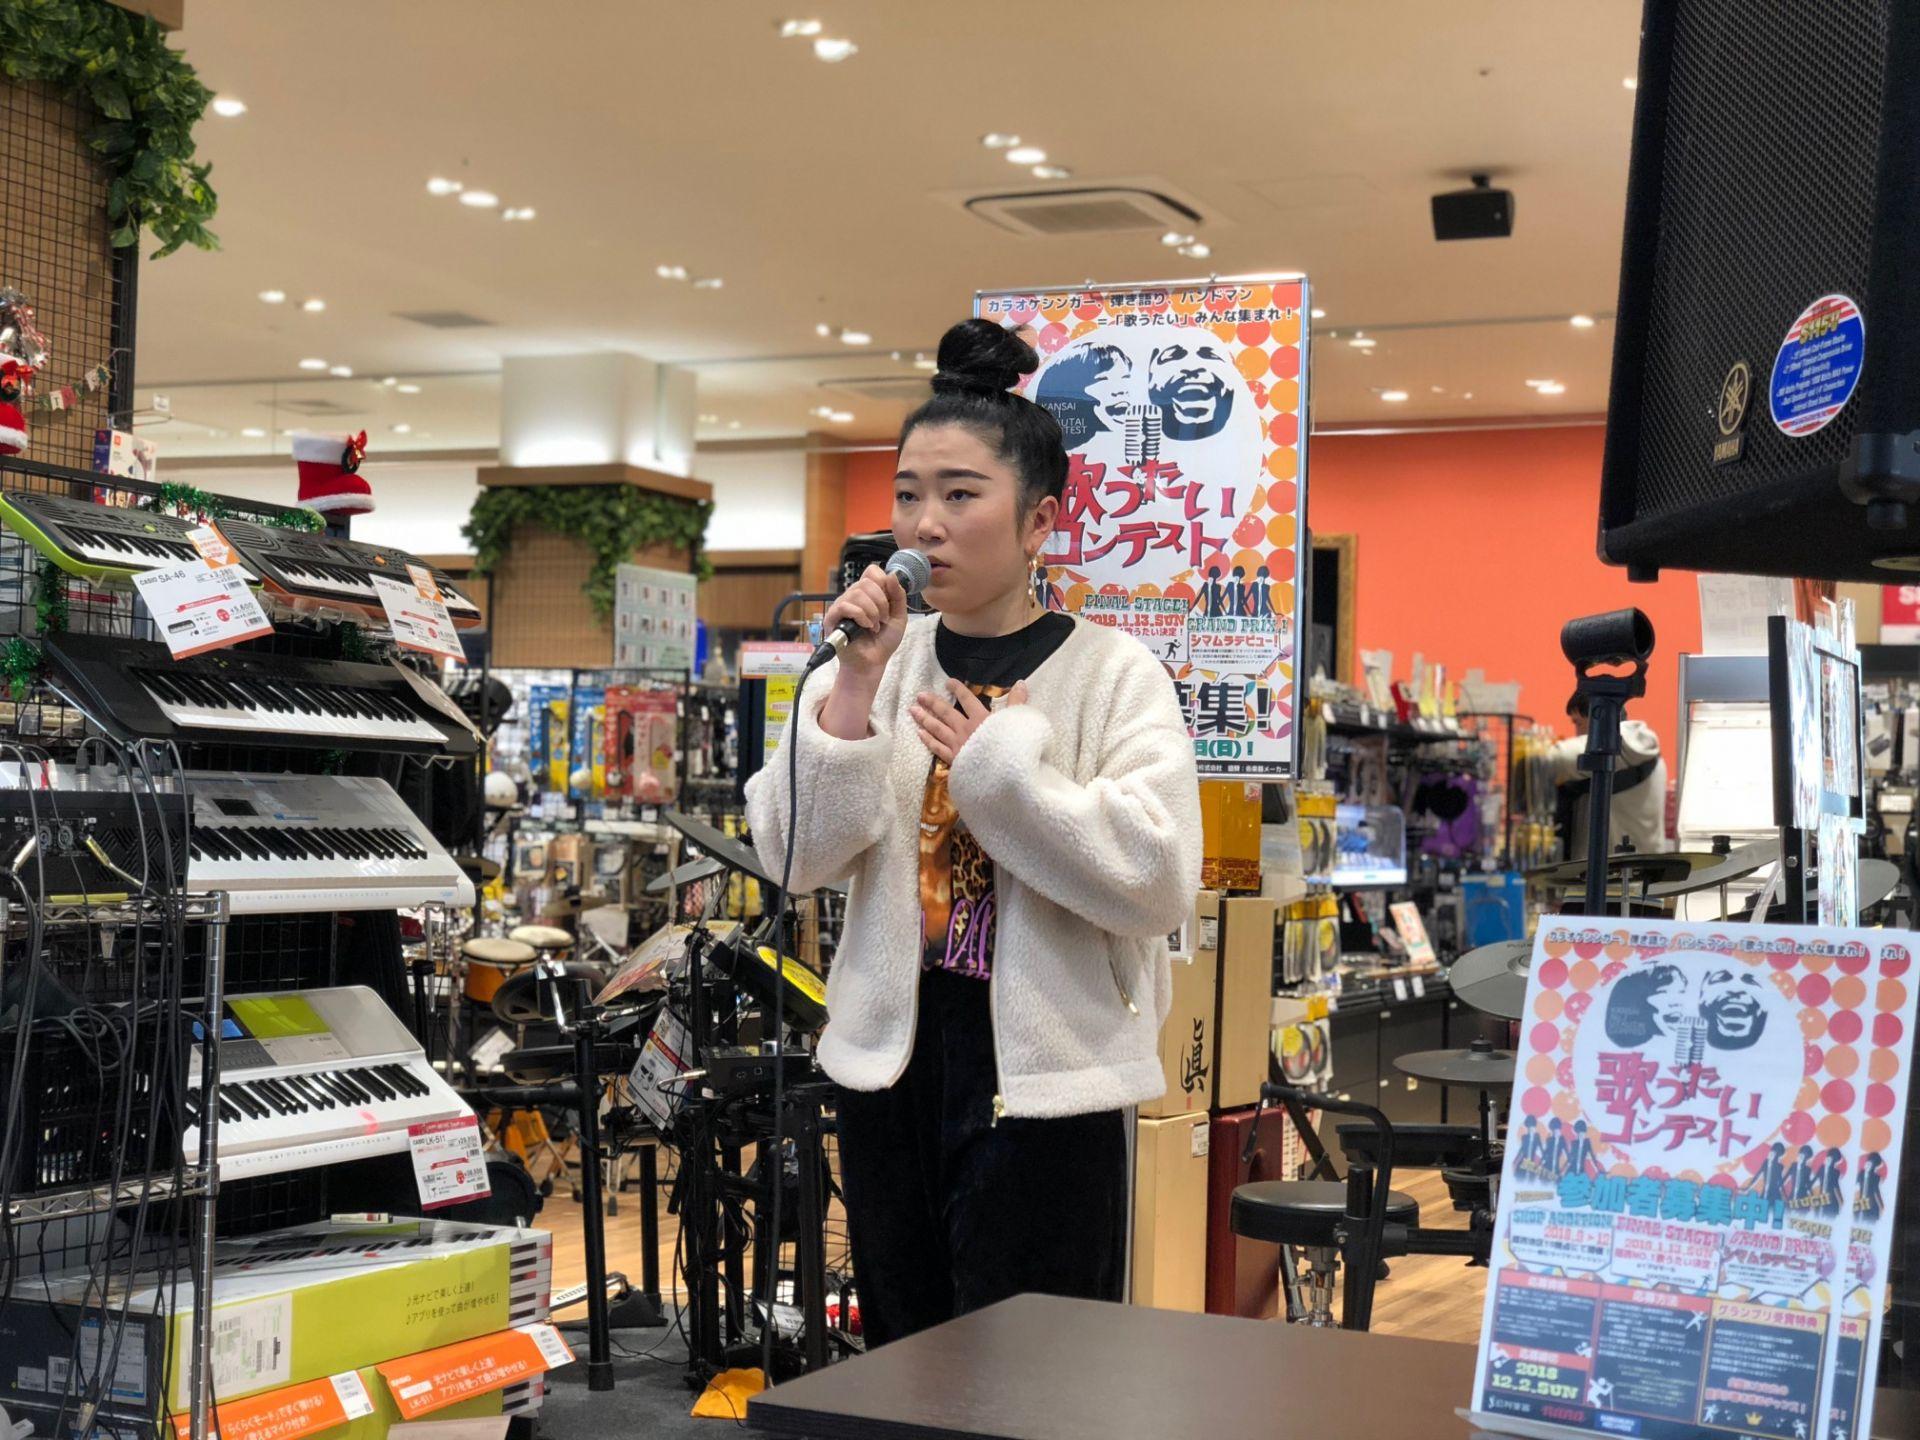 KAEDE / ららぽーとEXPOCITY店